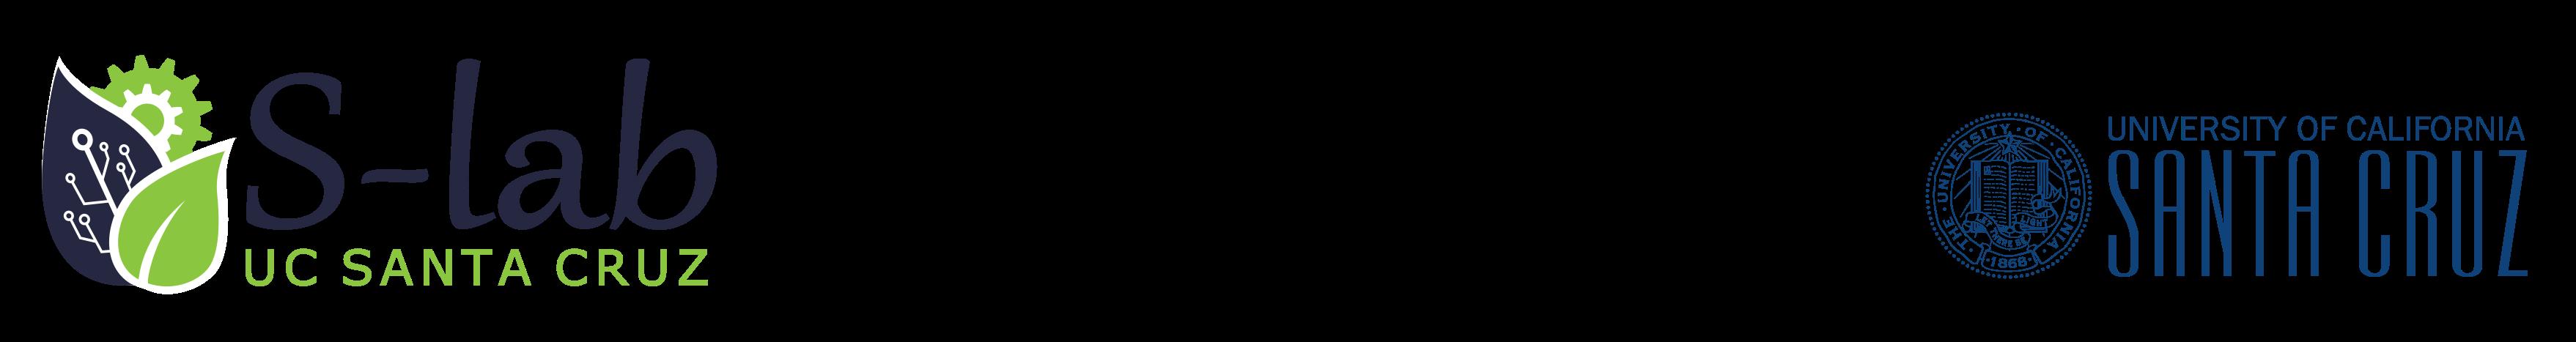 UCSC S-lab Logo